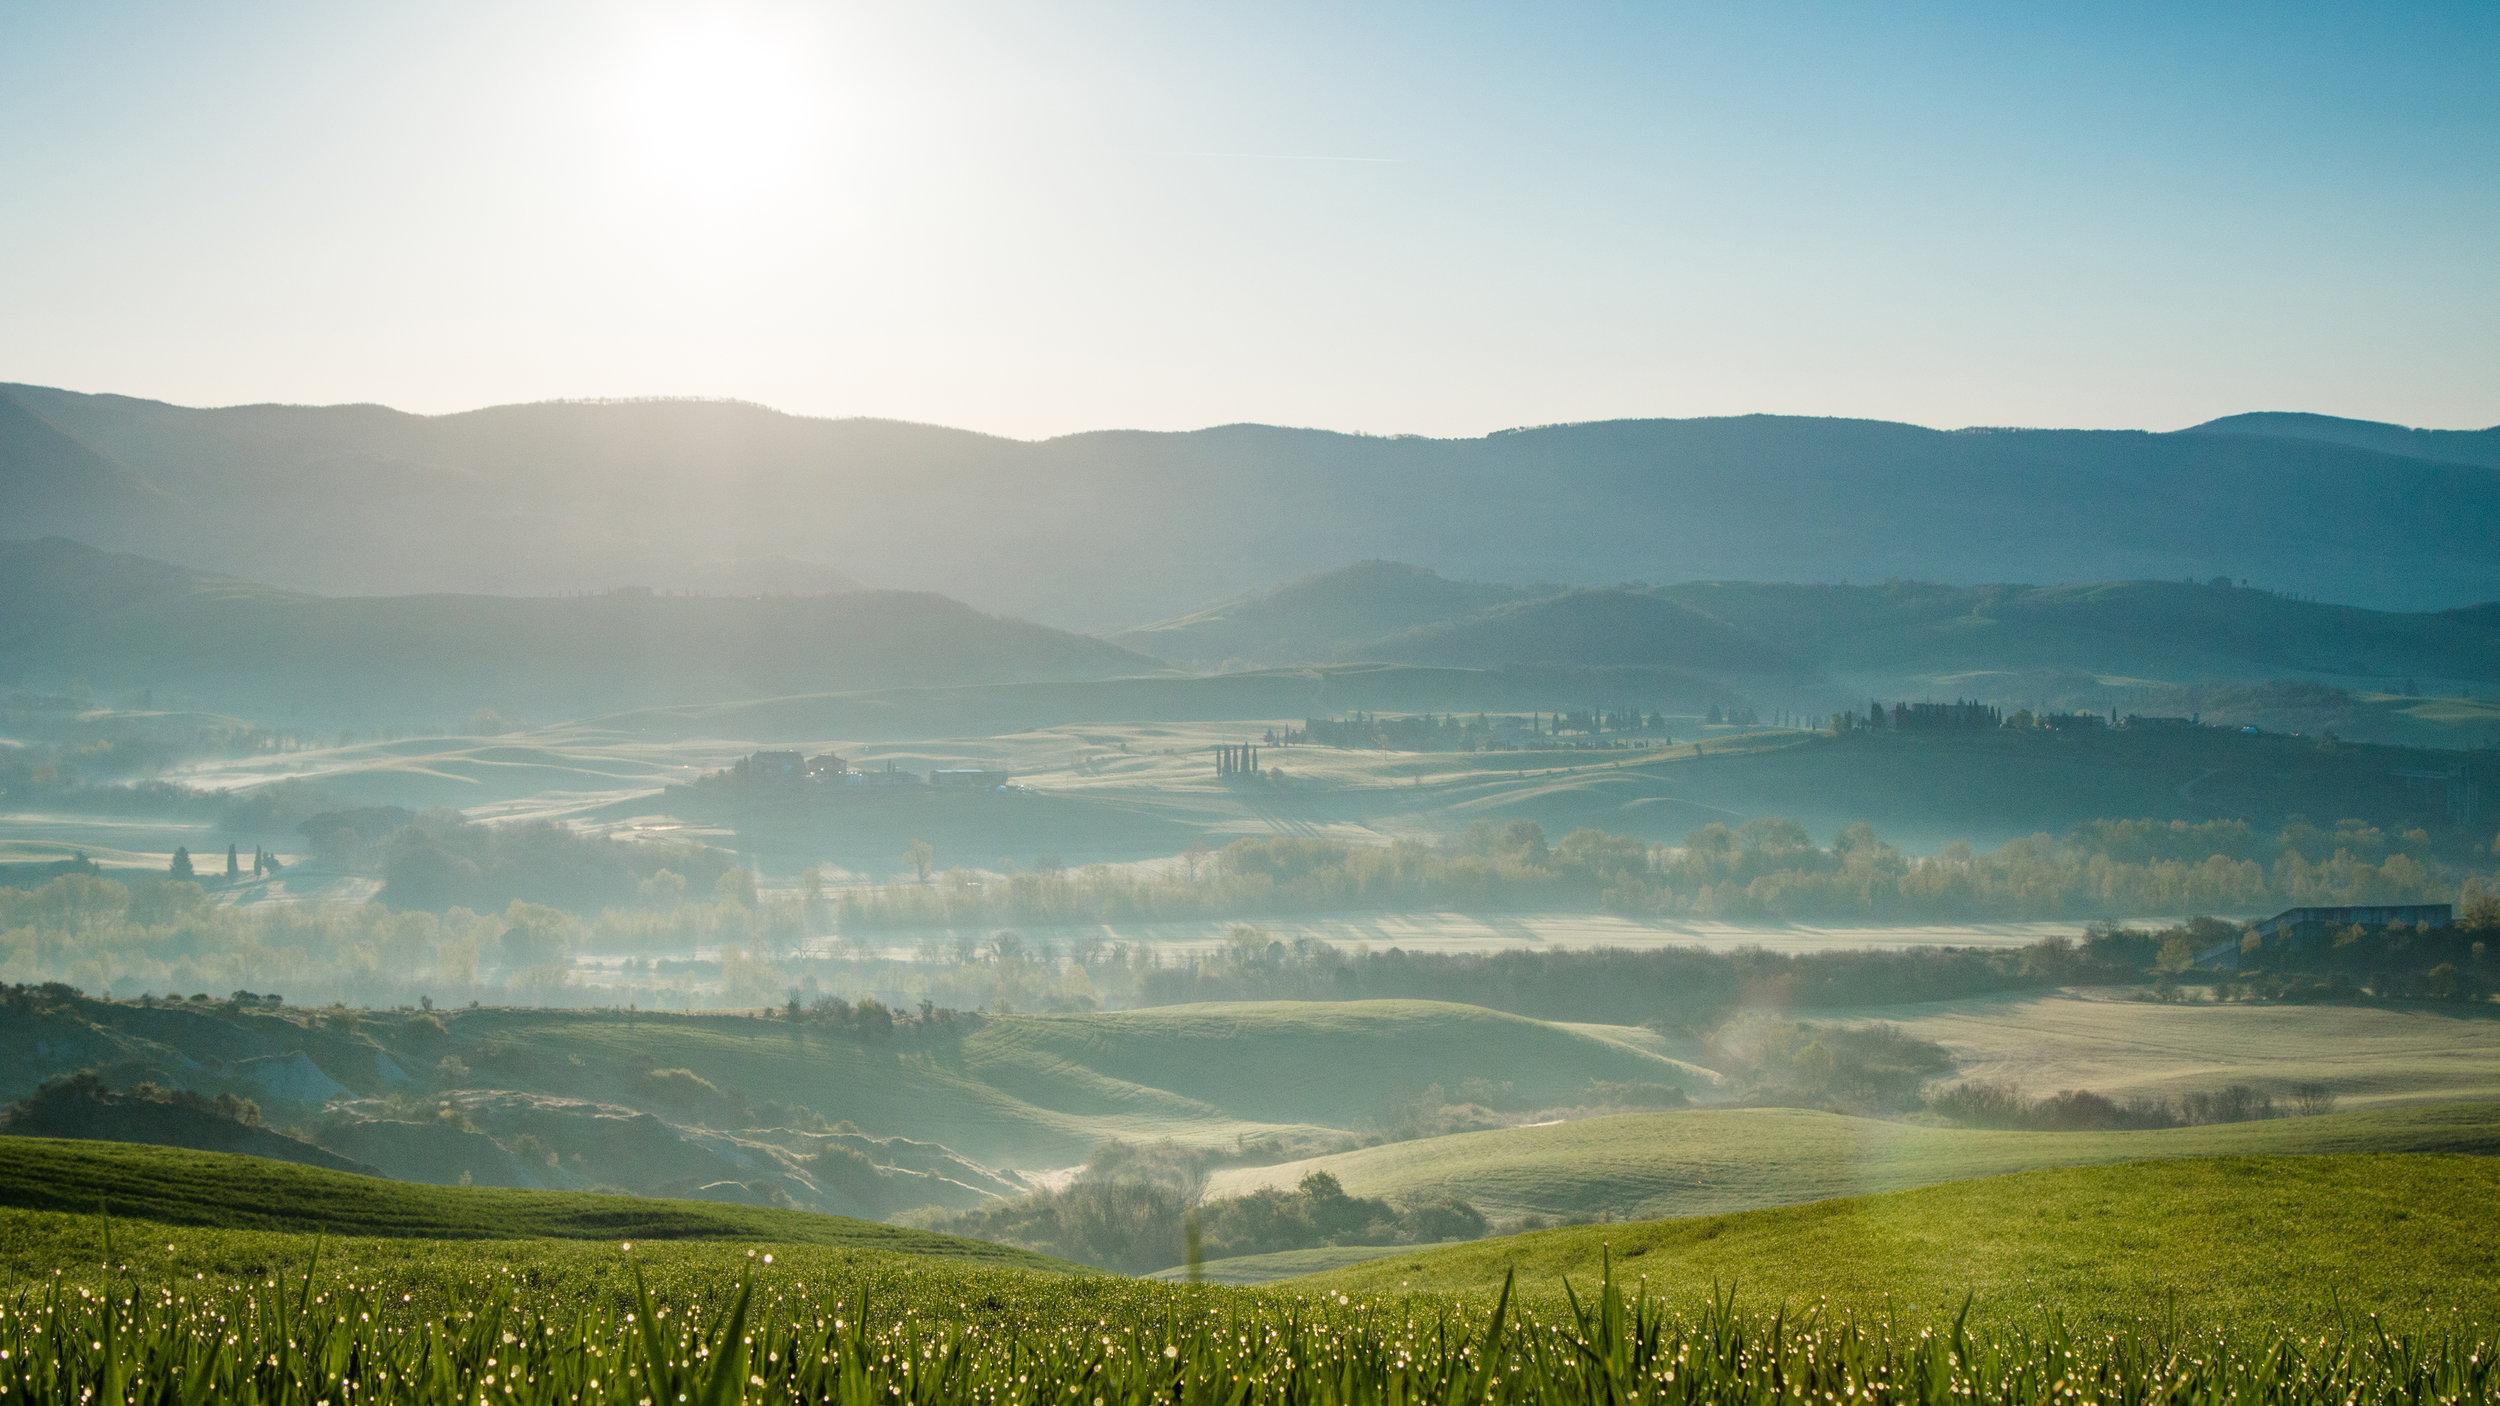 tuscan country 16x9.jpg